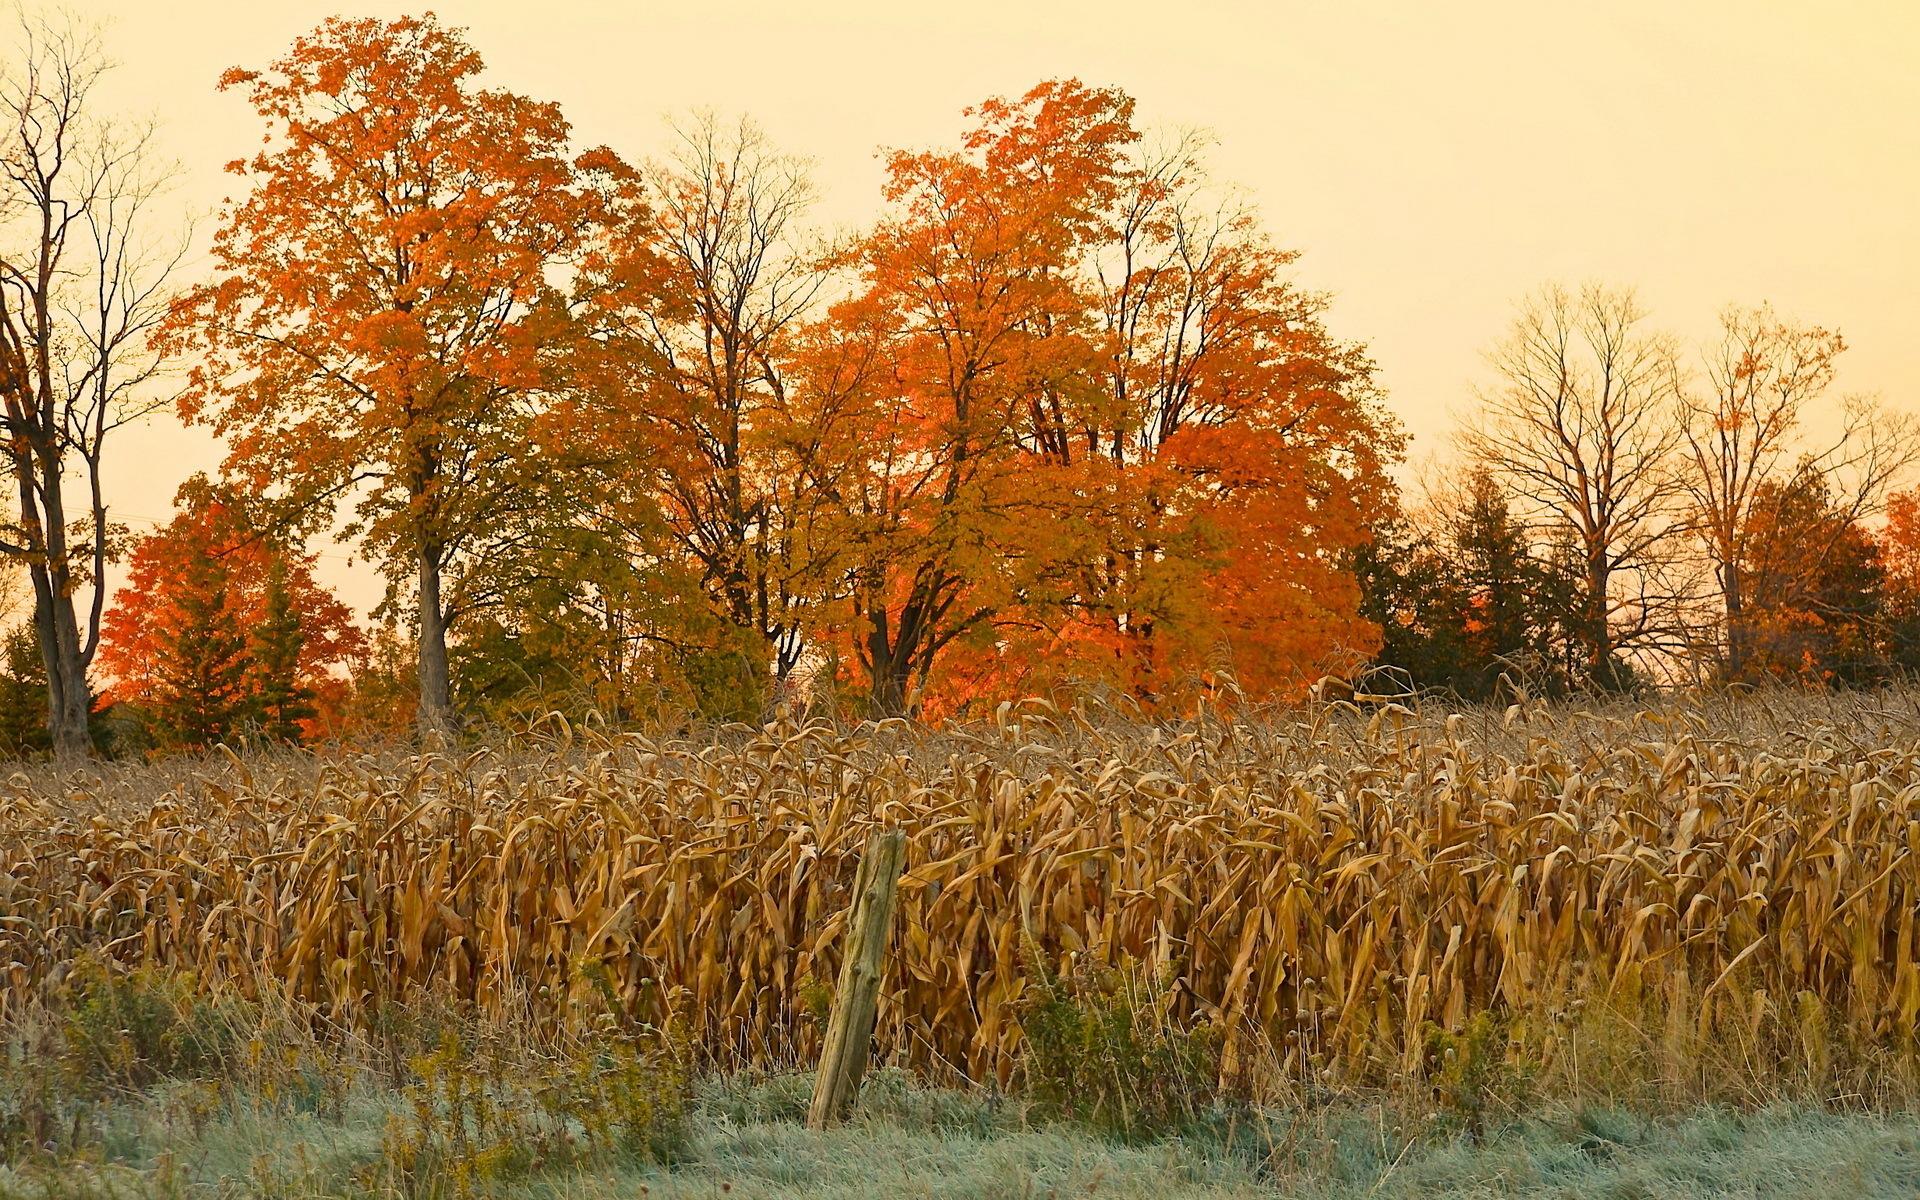 Corn Fields Field Autumn Nature Trees Thanksgiving Halloween 1920x1200